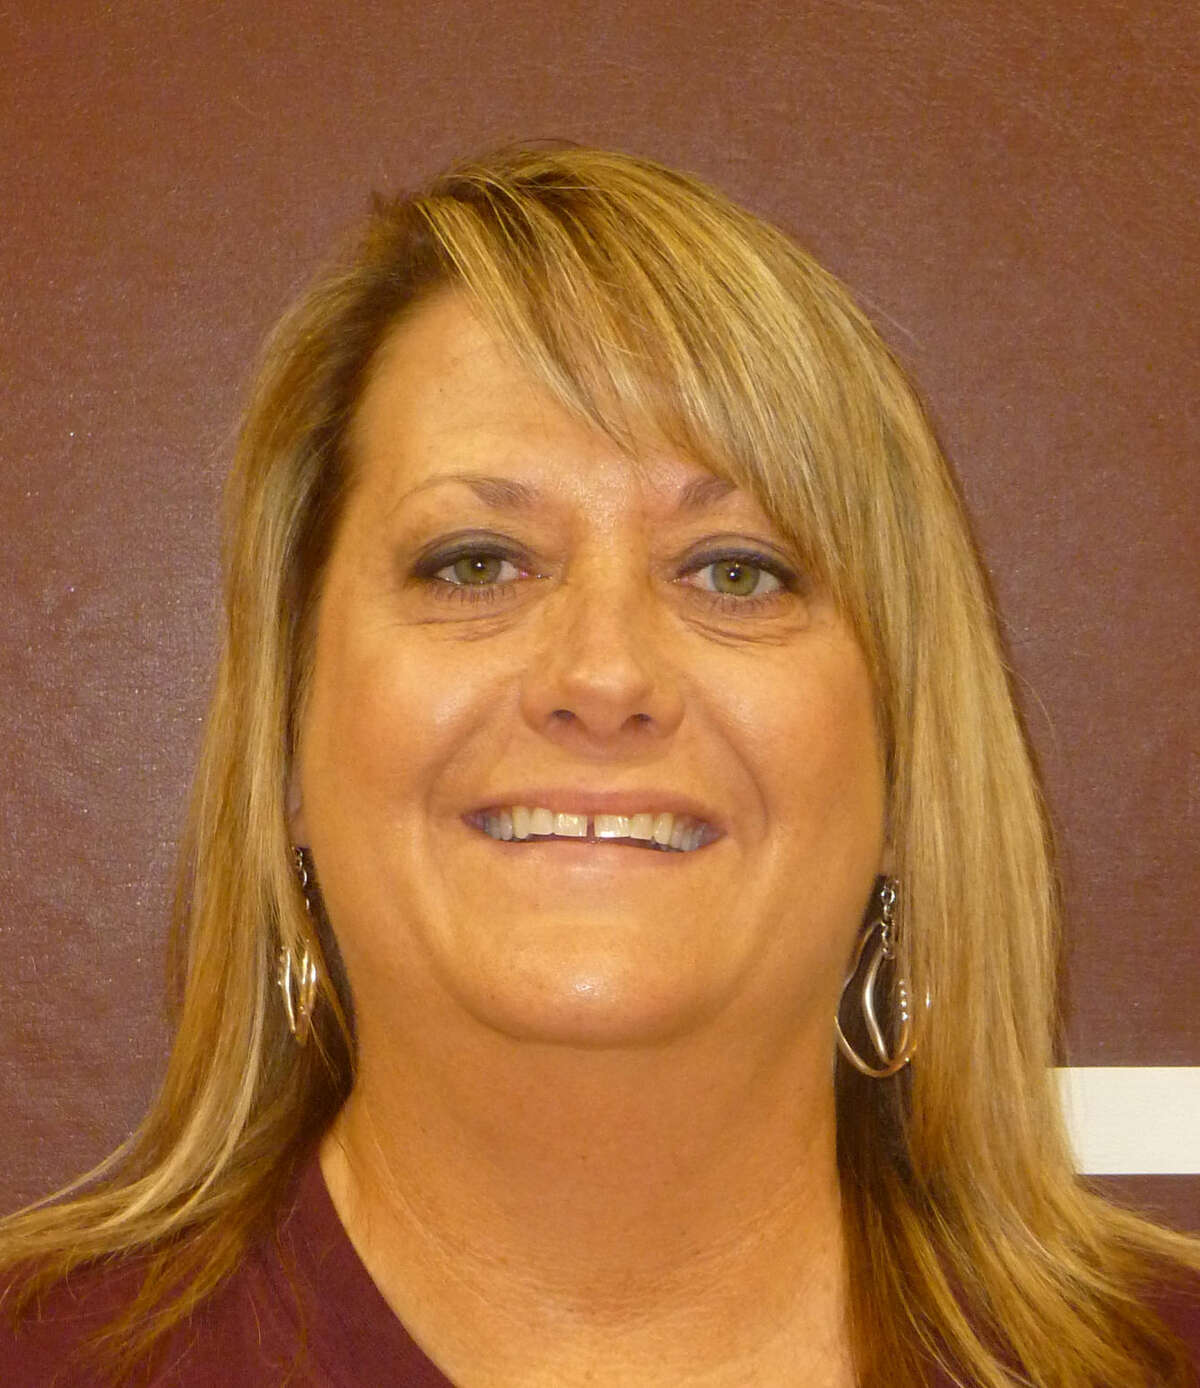 2014 Lee volleybal - Coach Daphne Rhoads